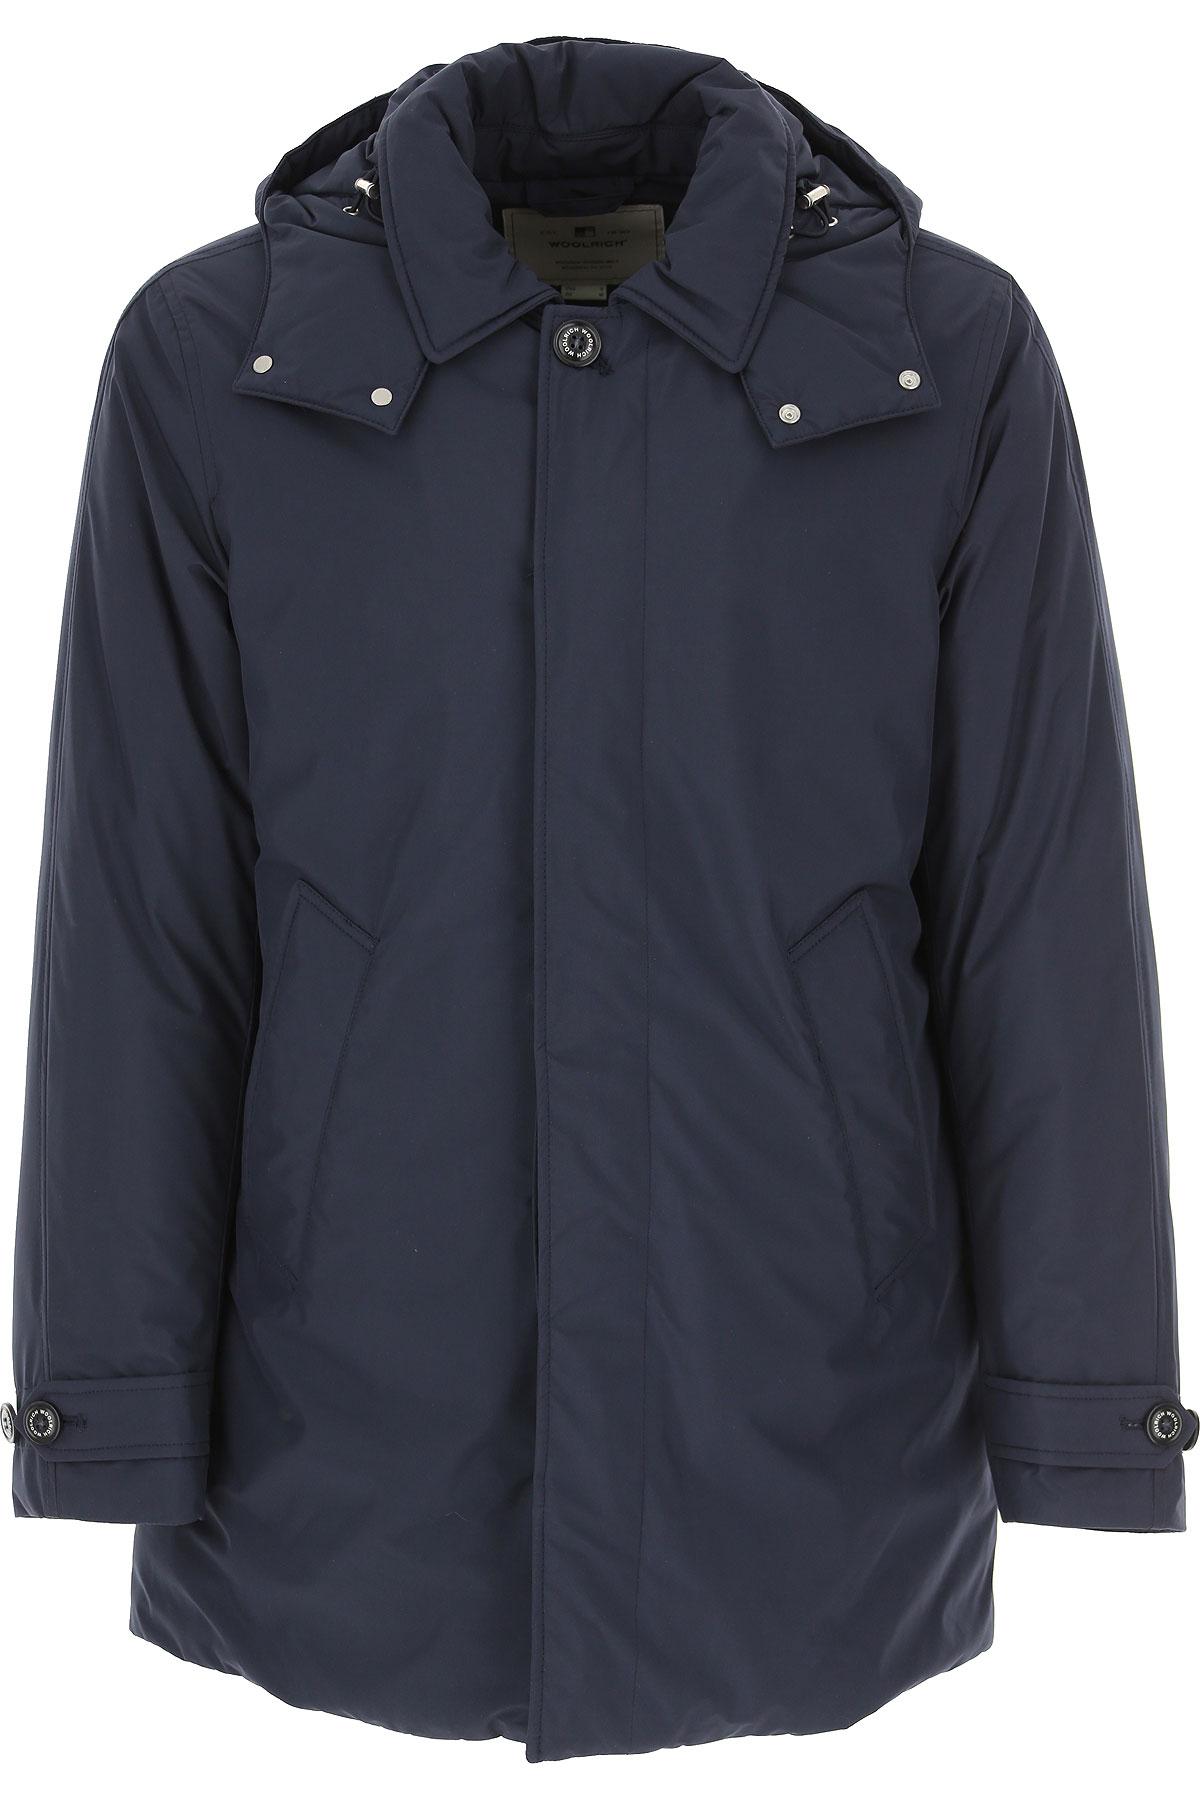 Woolrich Jean Homme Pas cher en Soldes, Bleu Melton, Polyester, 2017, 46 48 50 52 L M S XL XXL